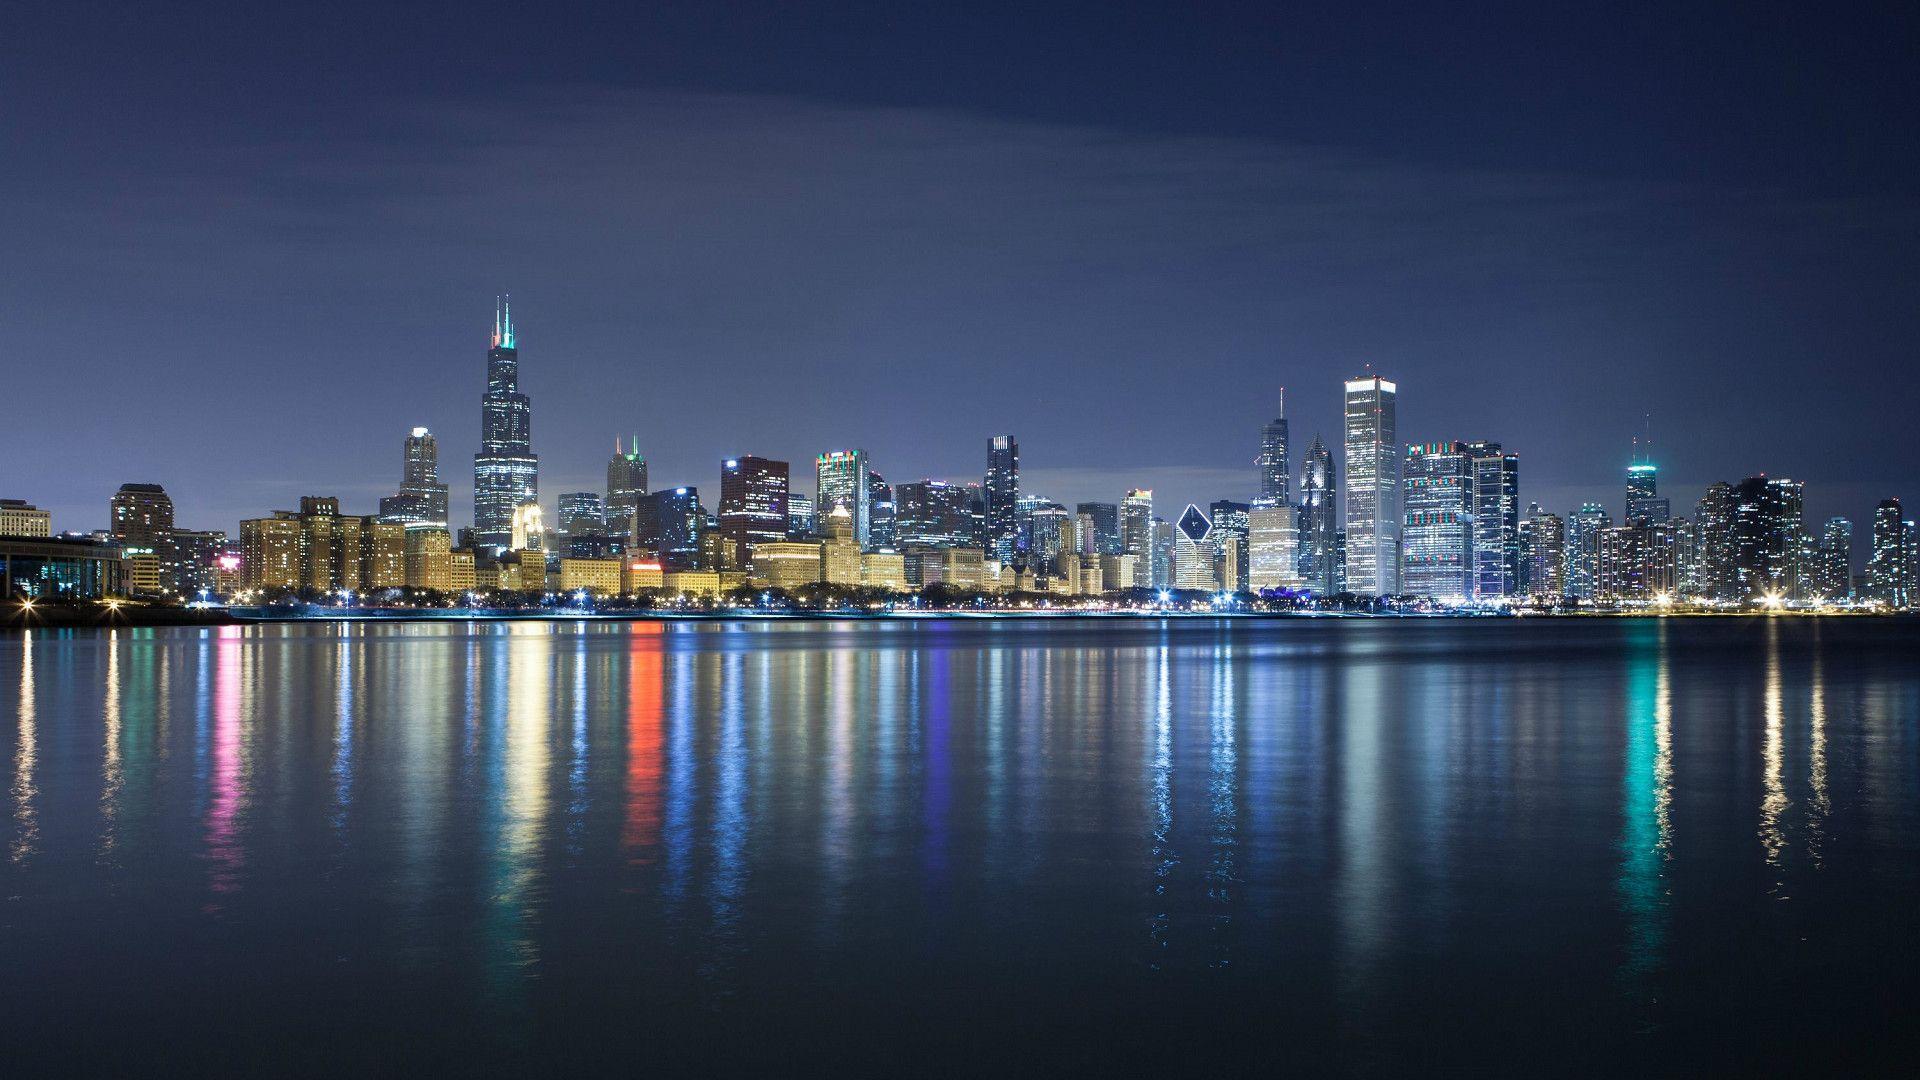 The Best Chicago Wallpaper Designs